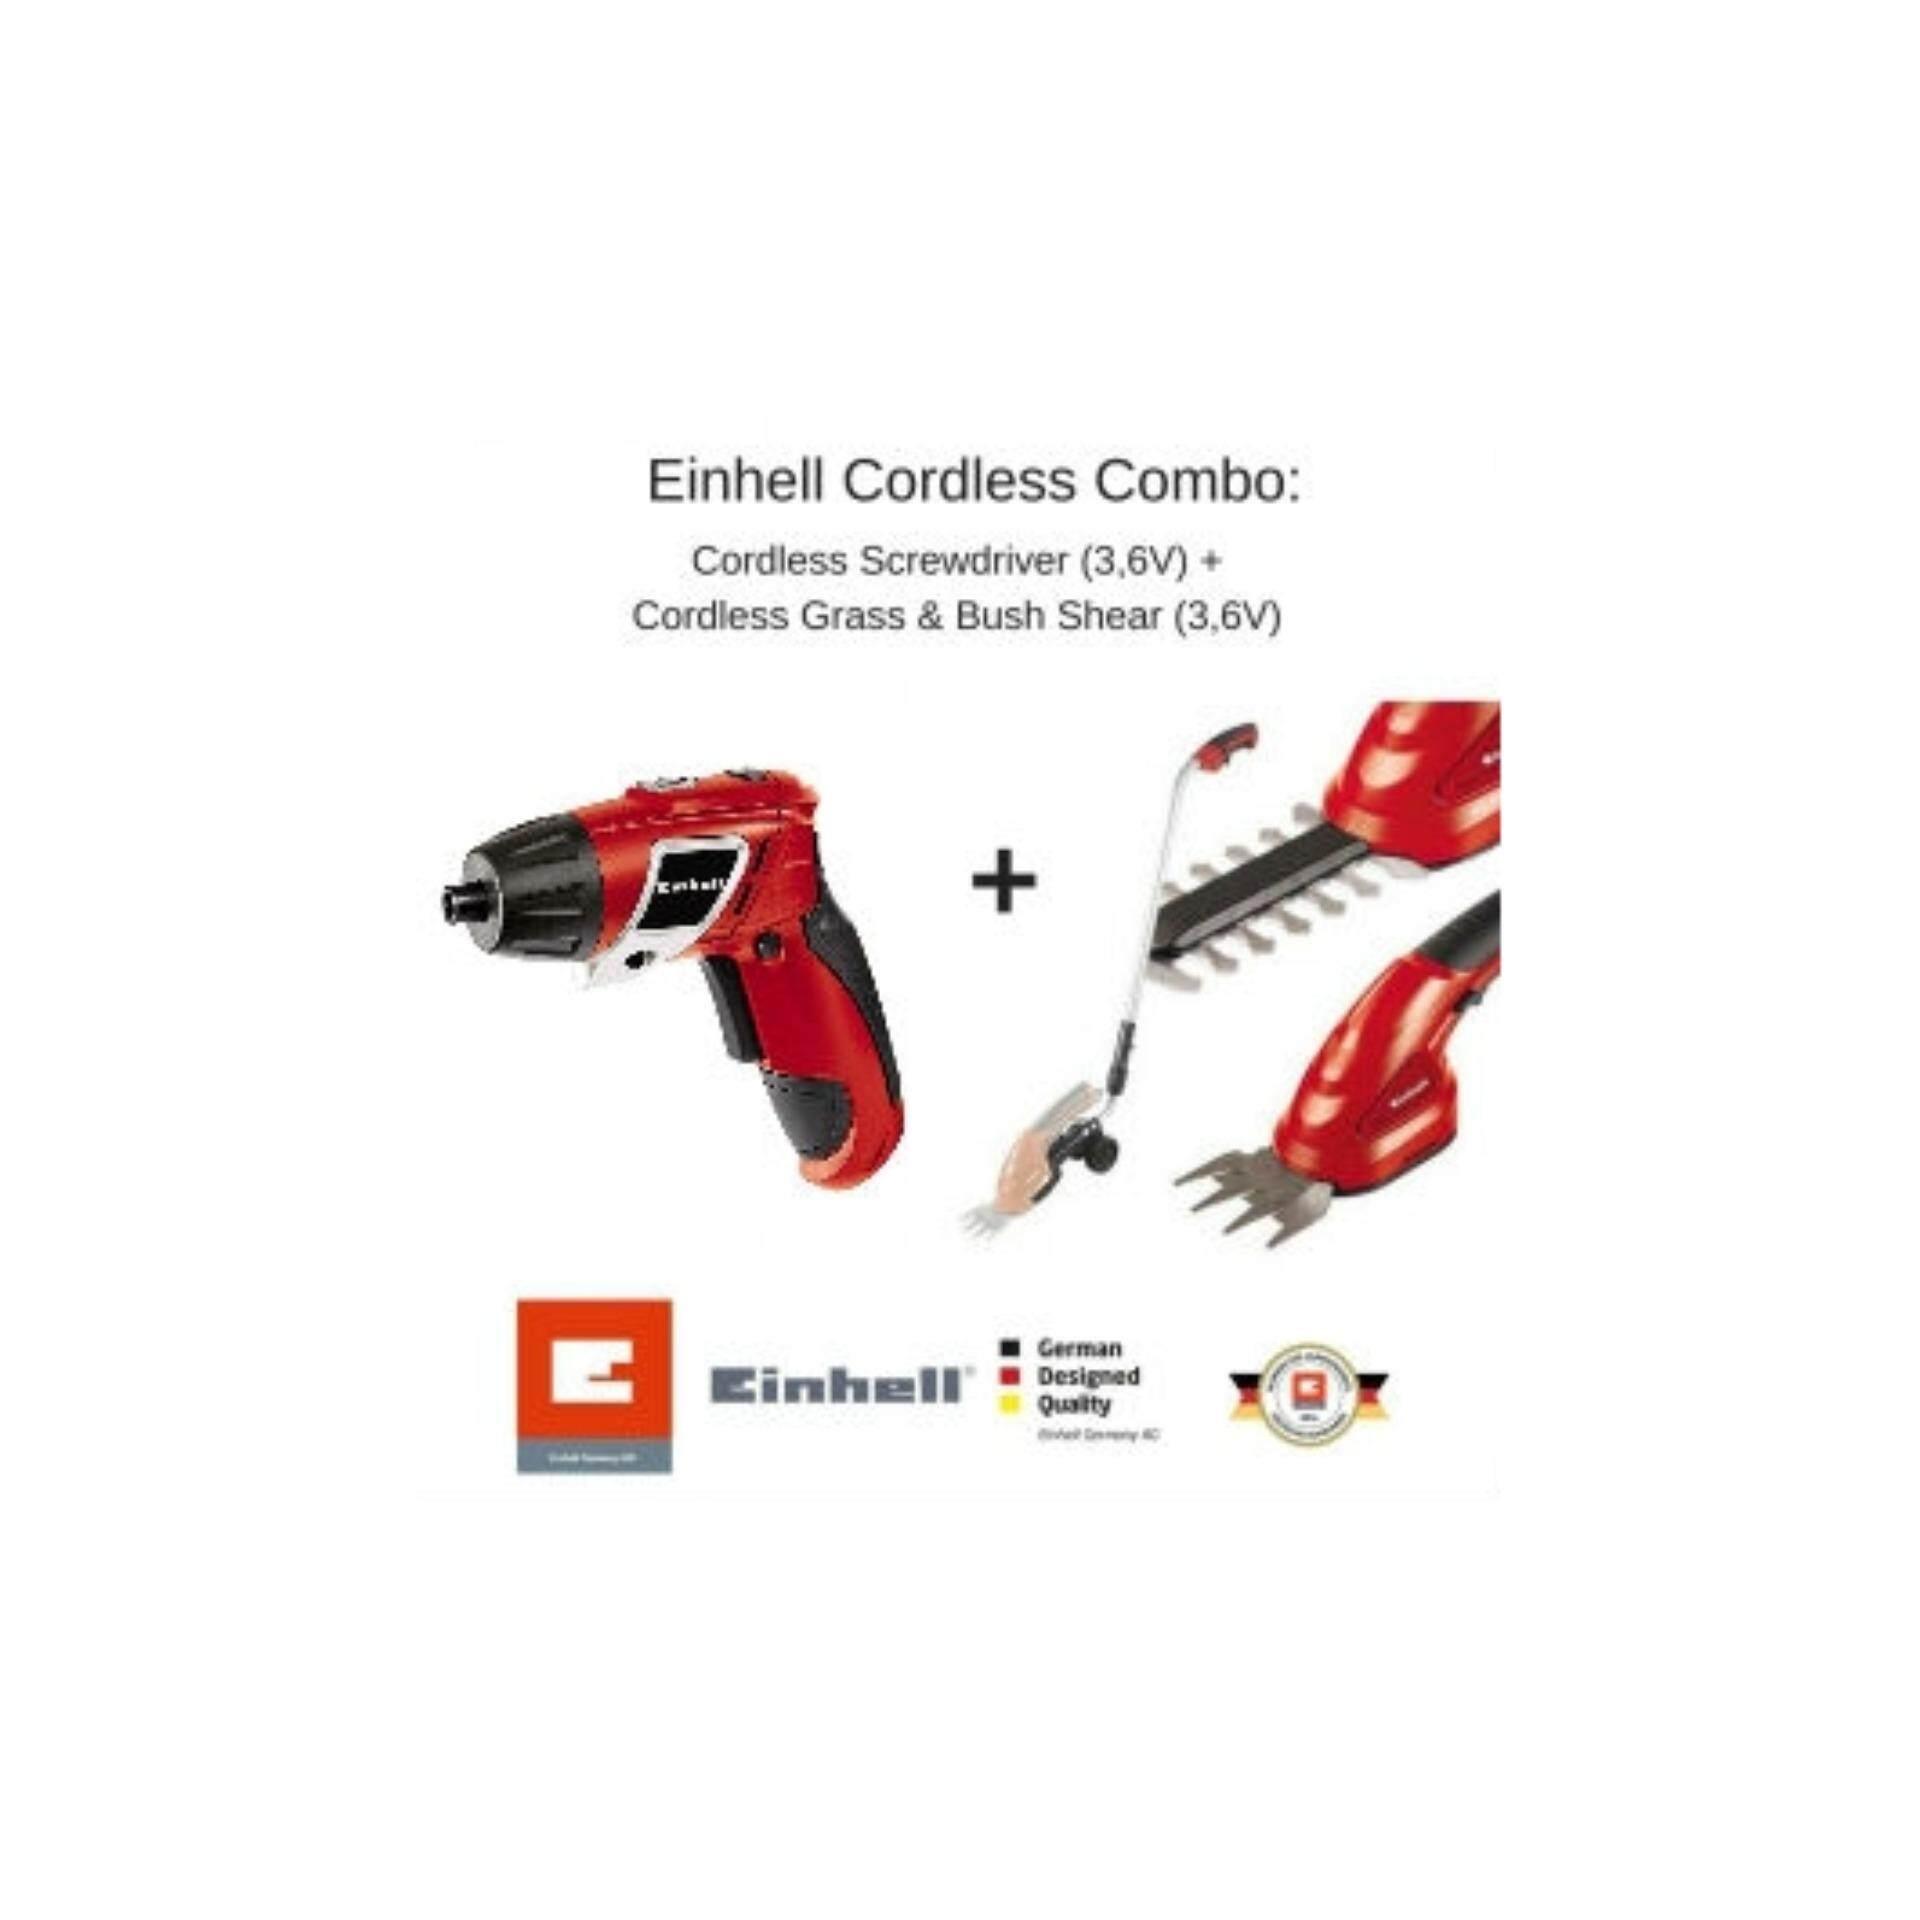 Einhell Cordless Combo : Cordless Screwdriver (3,6V) + Cordless Grass & Bush Shear (3,6V)